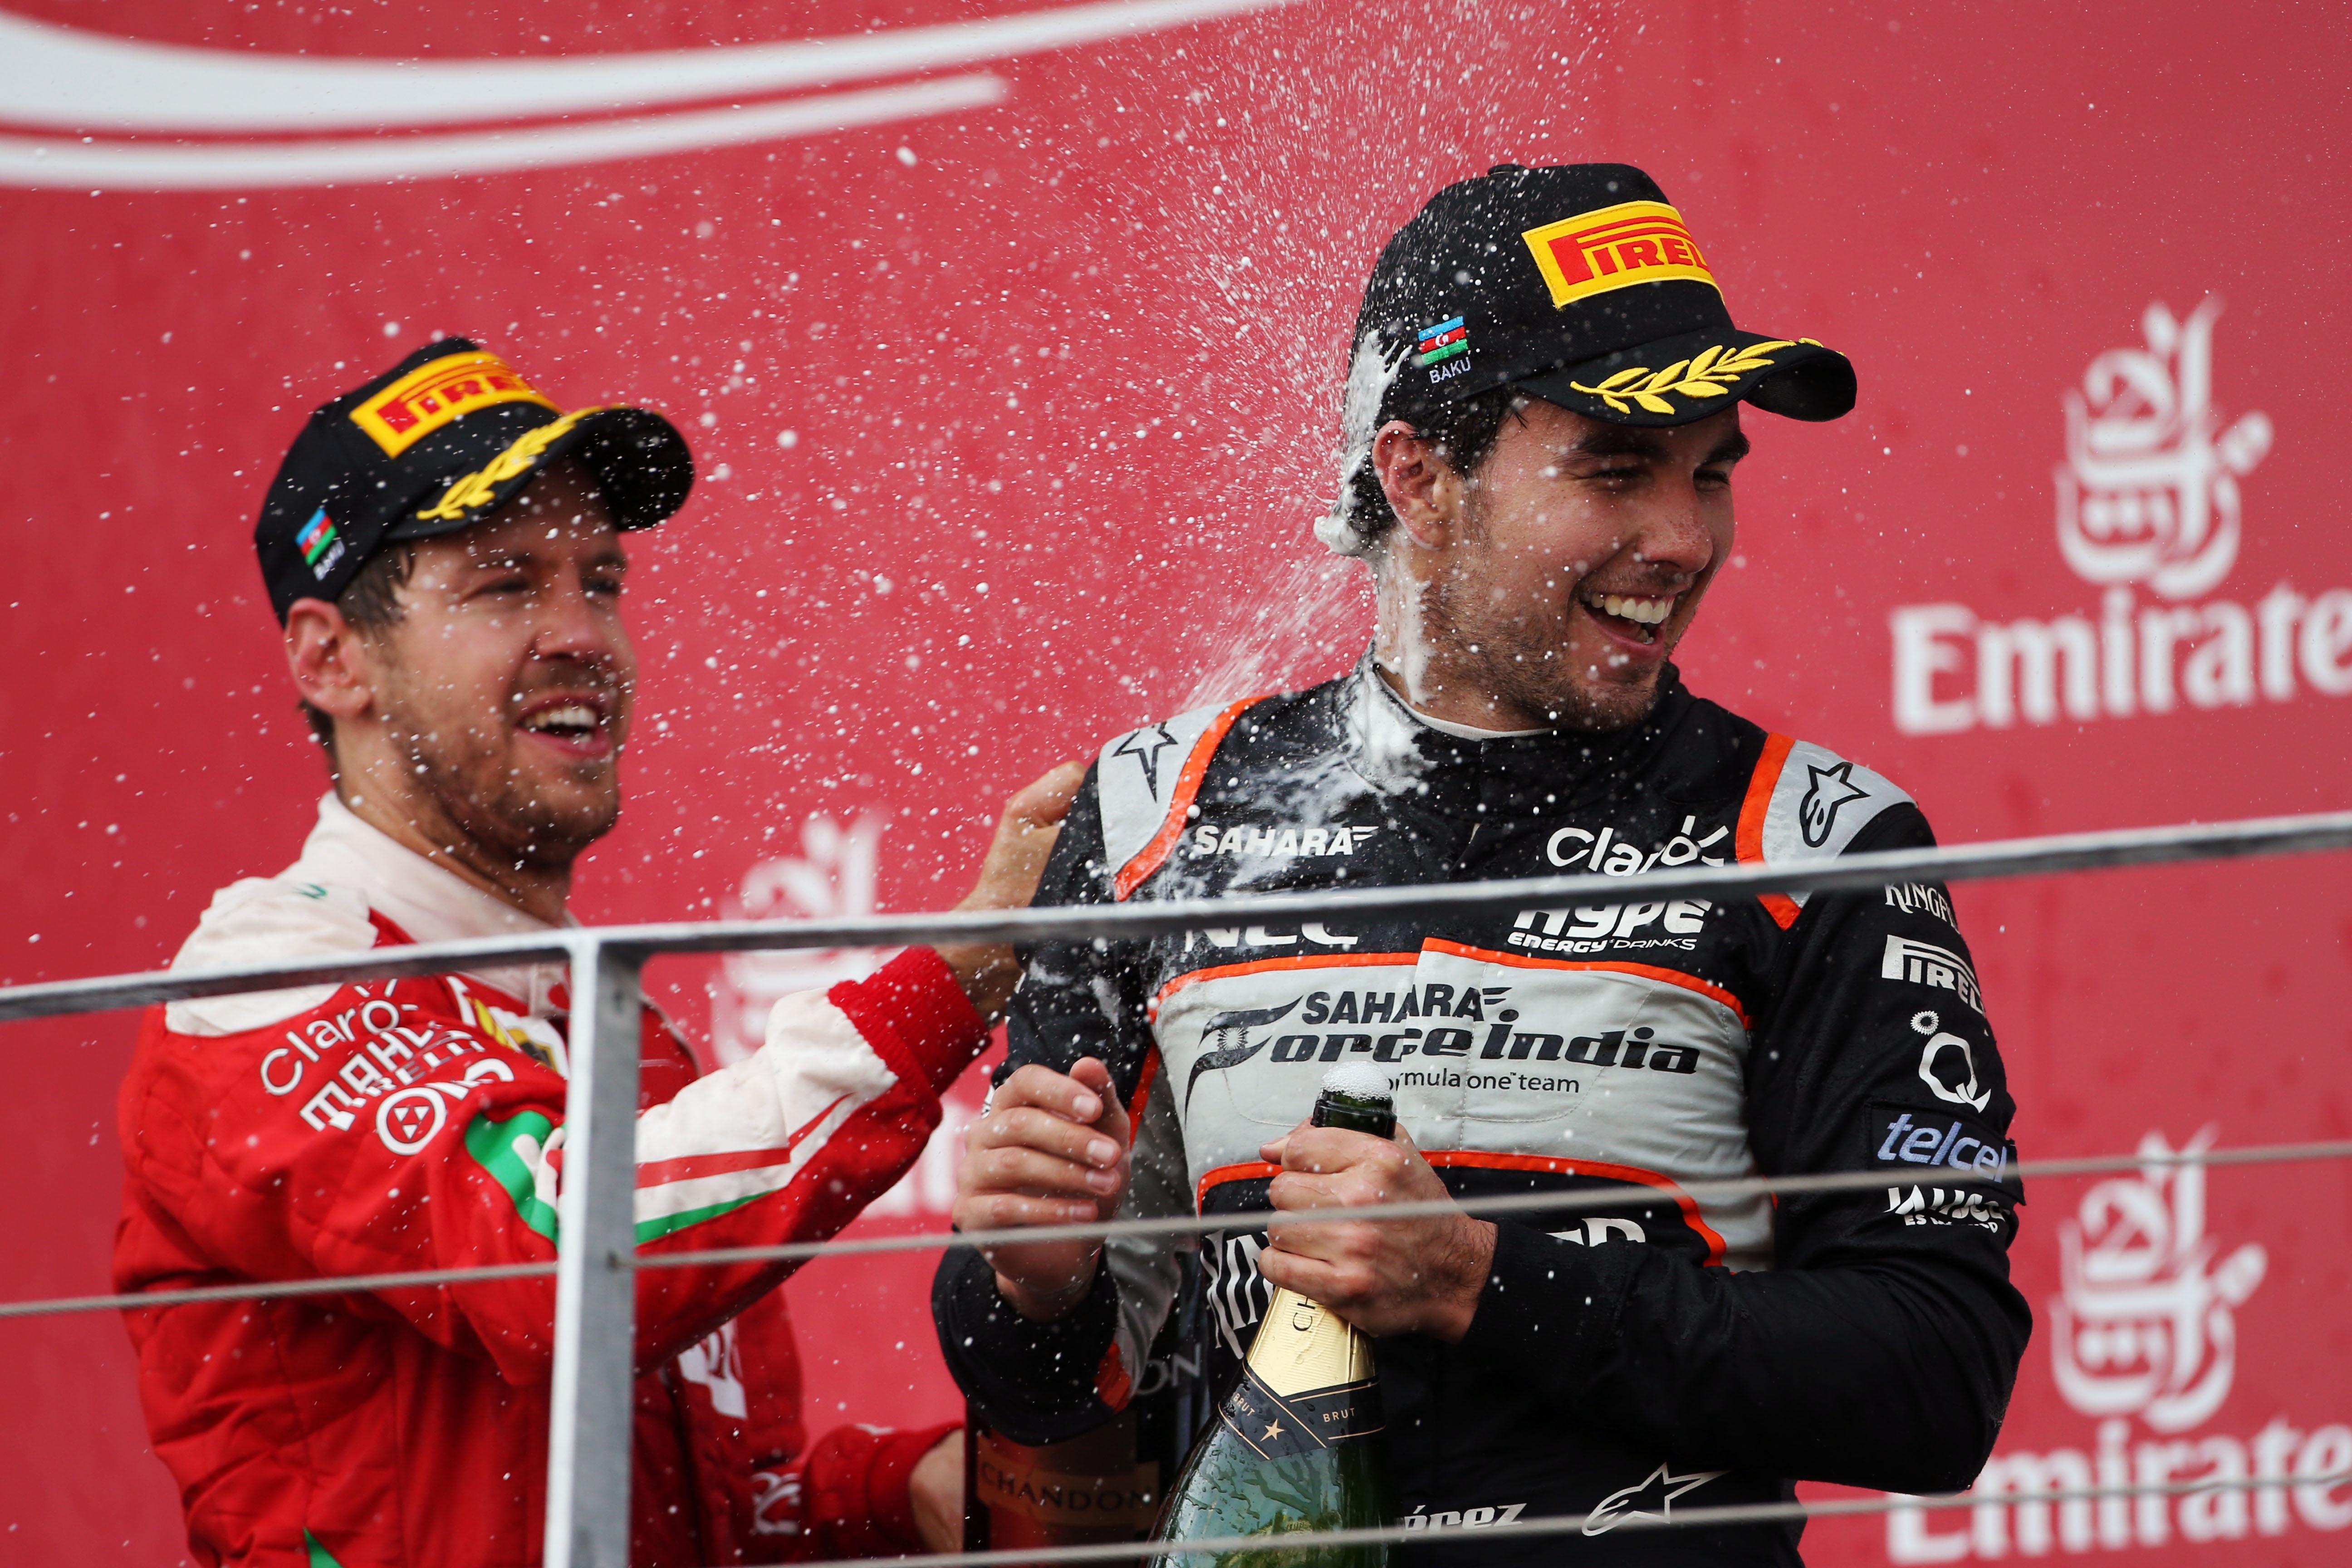 Motor Racing Formula One World Championship European Grand Prix Race Day Baku, Azerbaijan